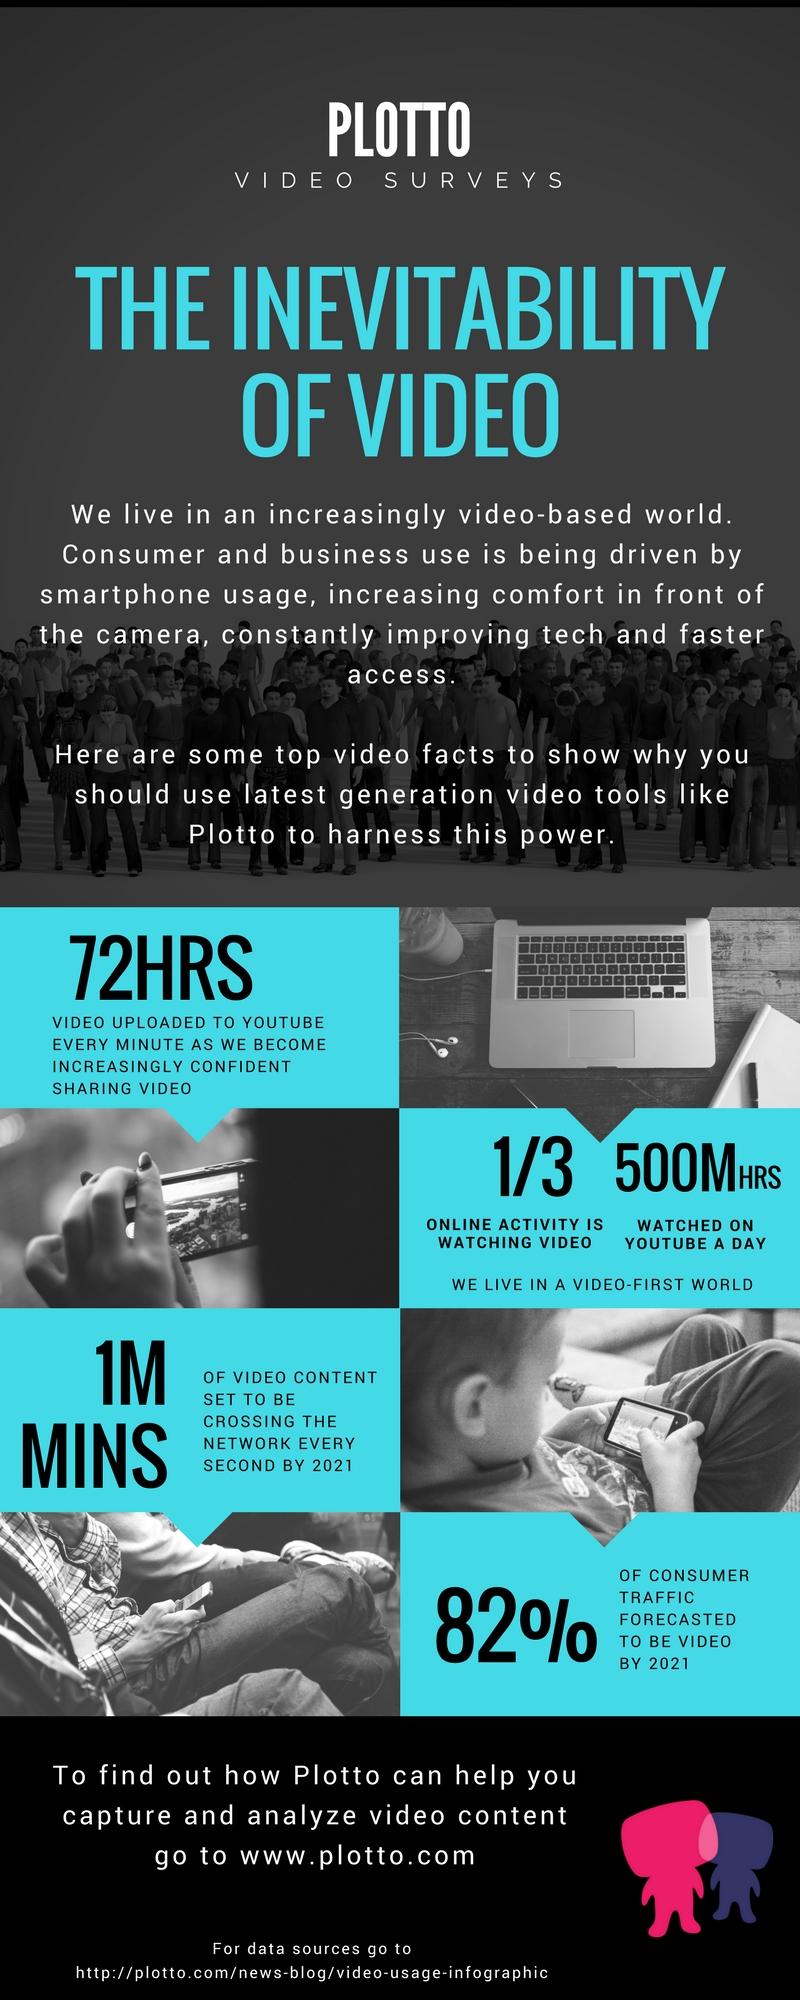 Plotto_video_infographic.jpg